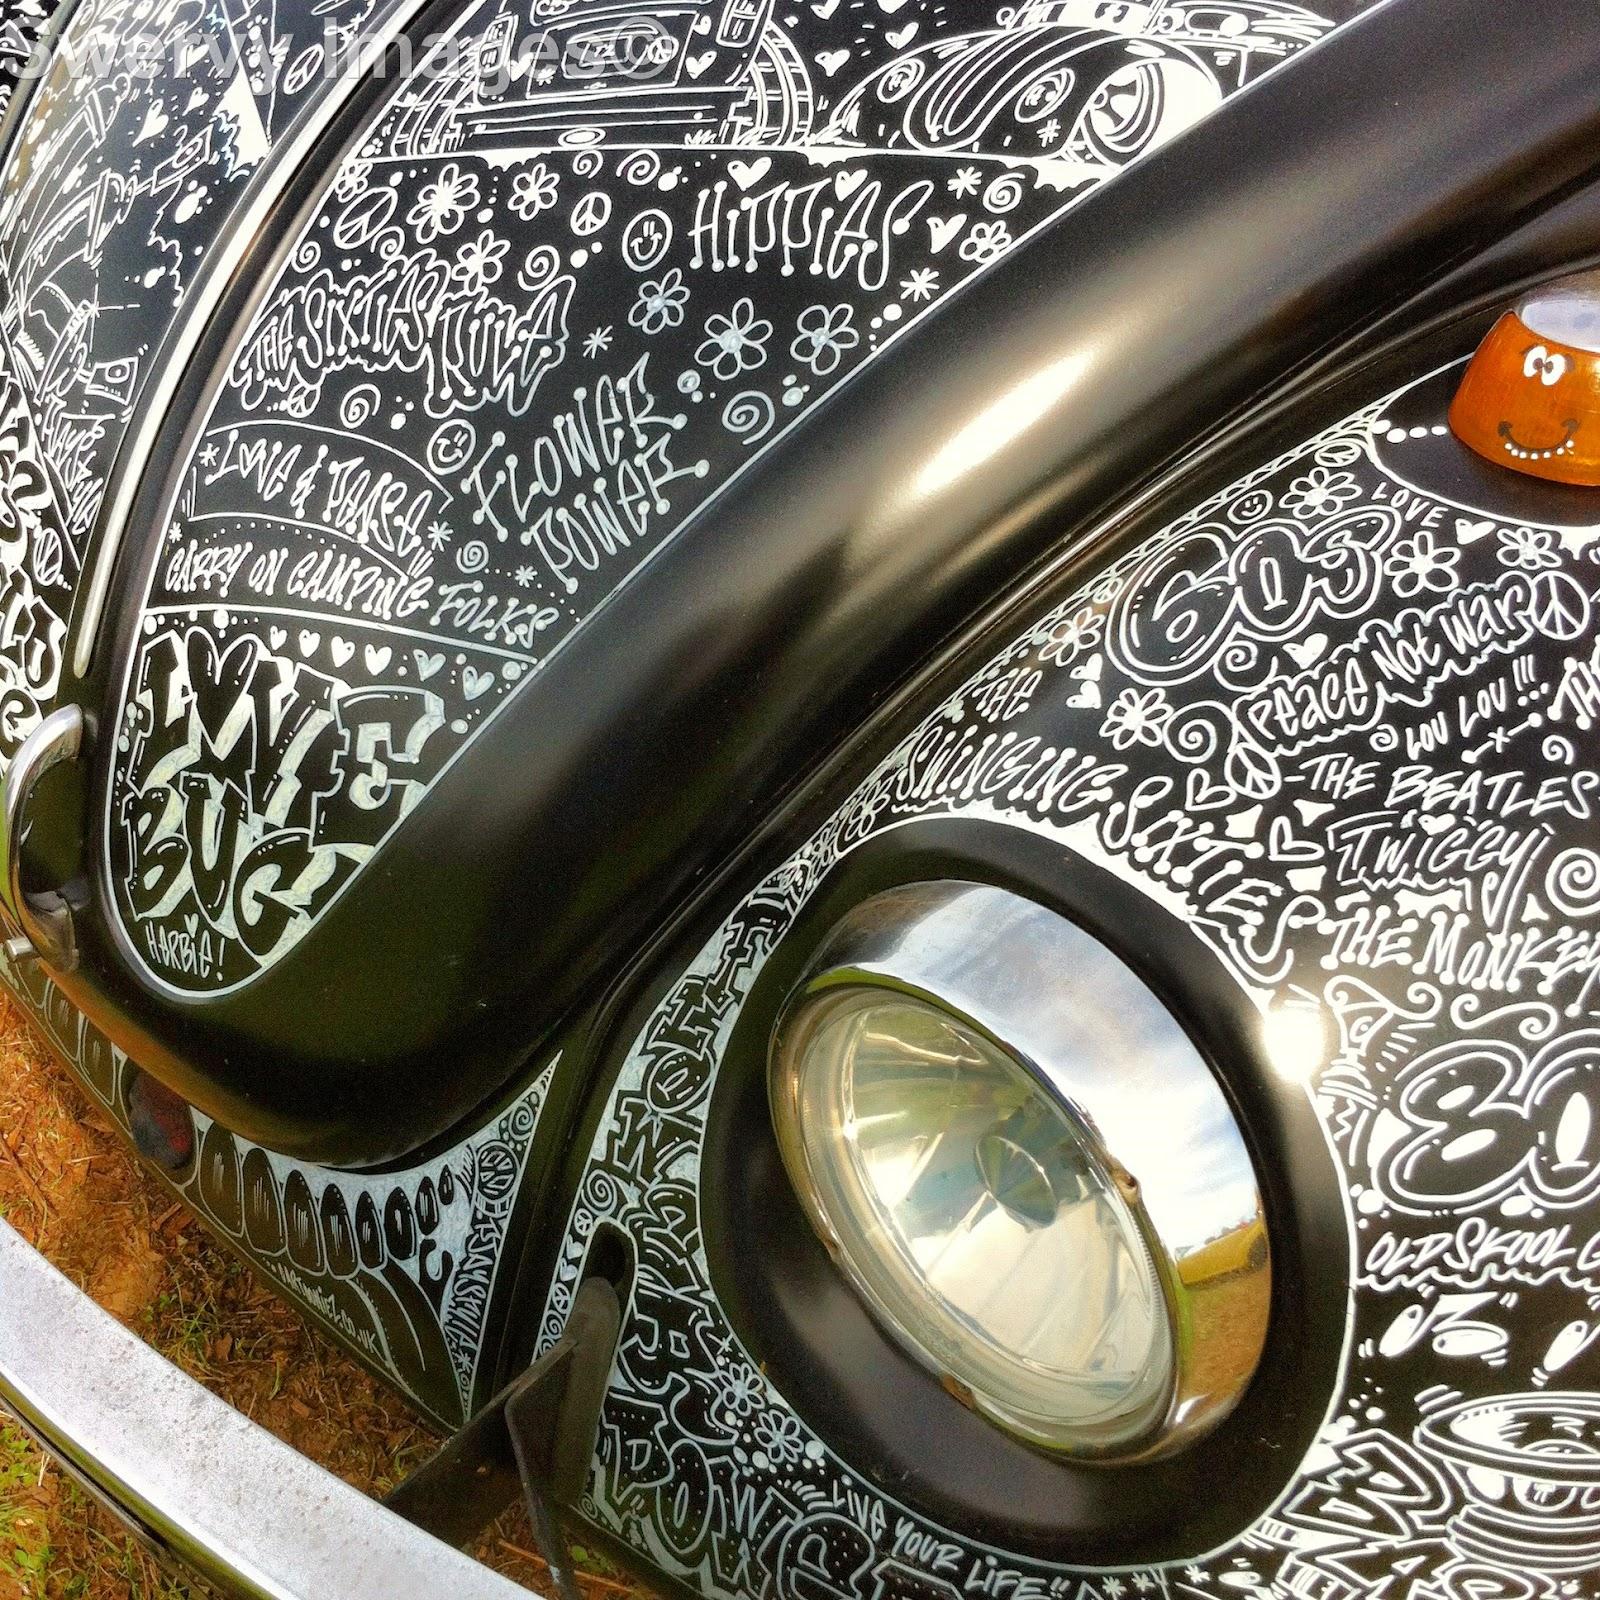 vw Beetle Graffiti Graffiti vw Beetle